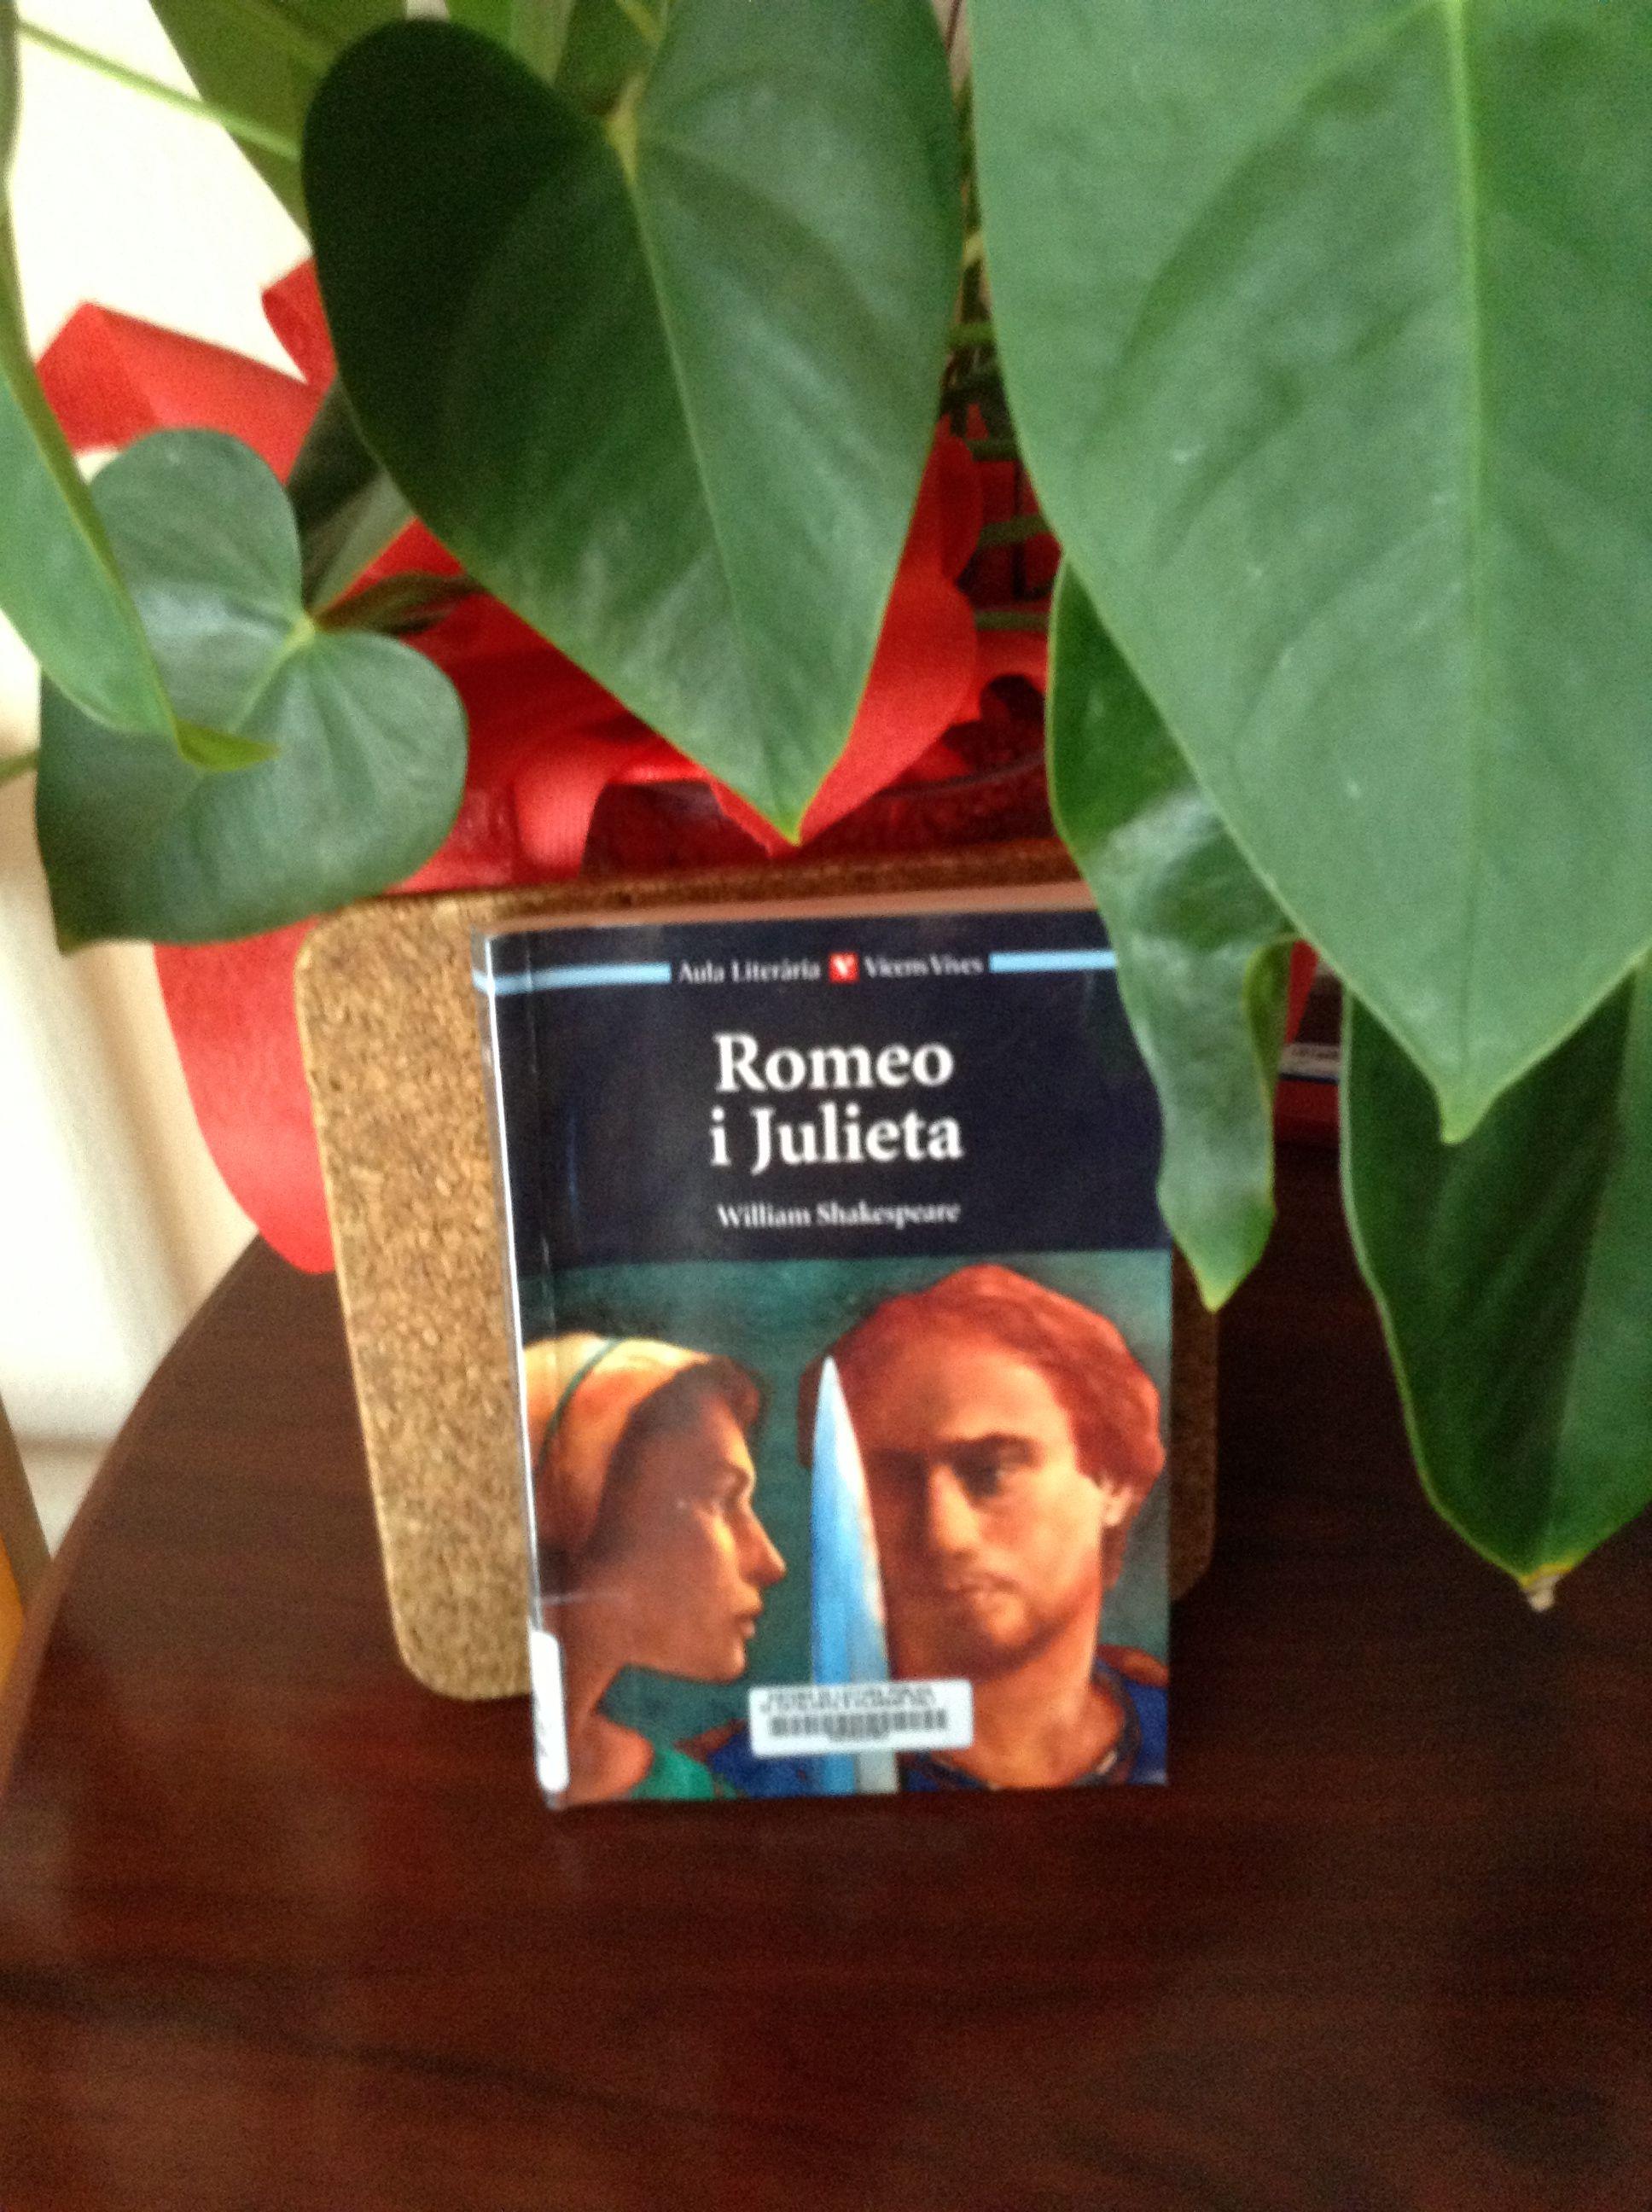 ROMEU I JULIETA / William Shakespeare                                                              http://open.spotify.com/track/6vU2CO4364yzG5fK9eIPv